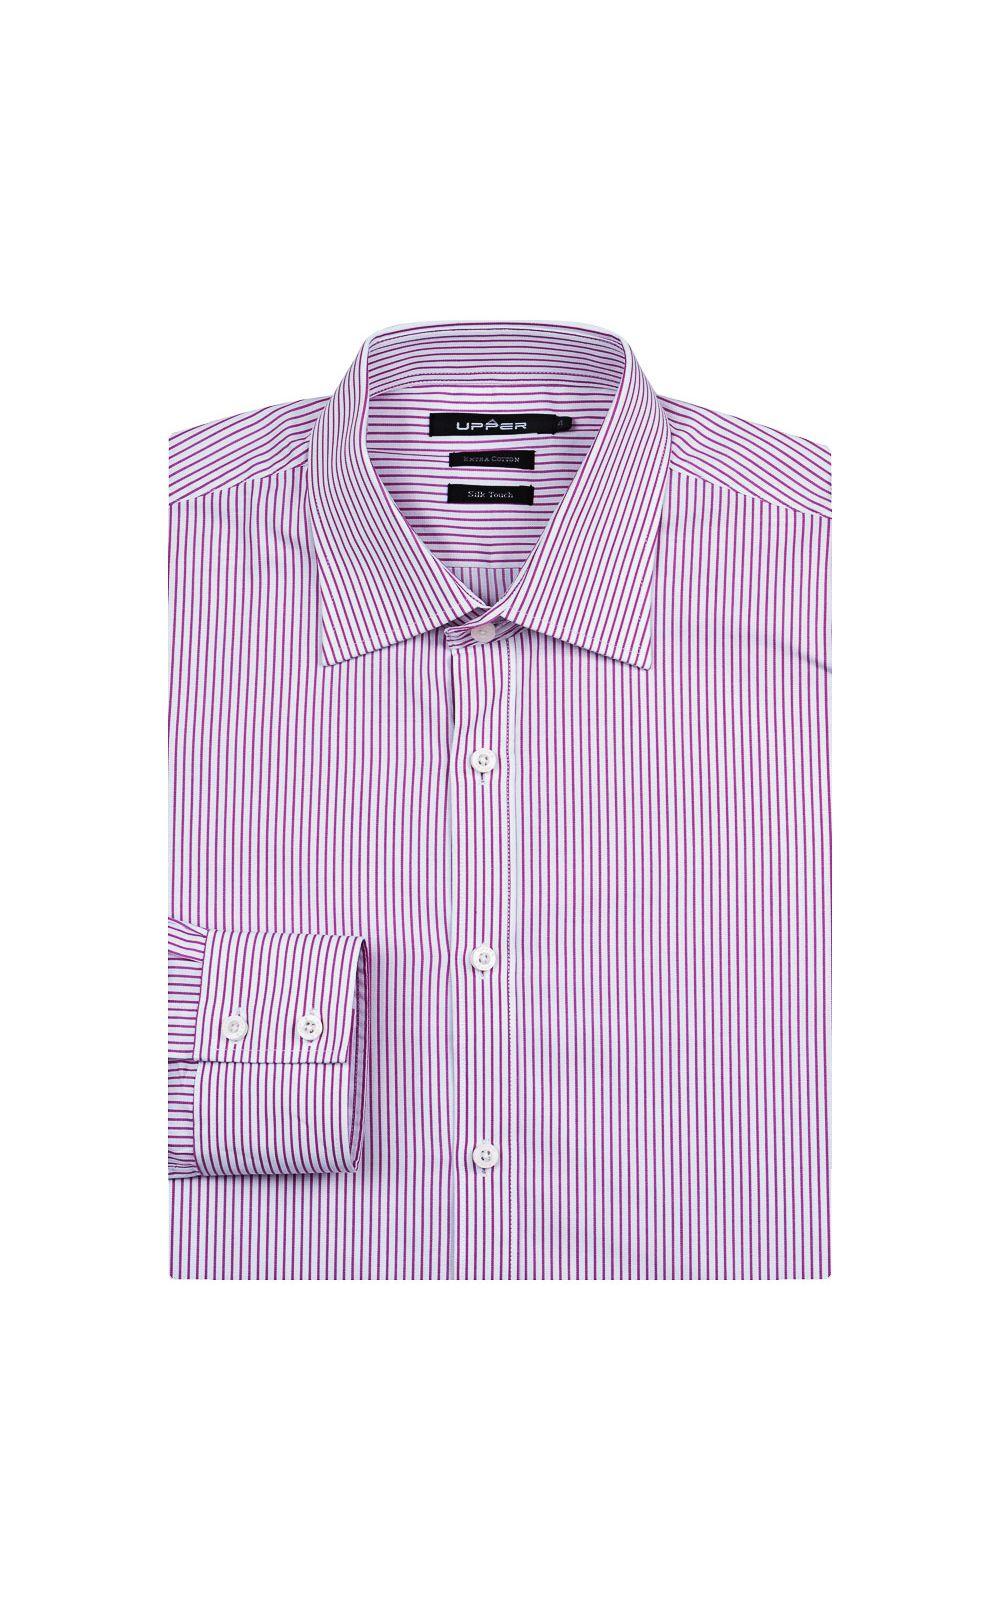 Foto 4 - Camisa Social Masculina Rosa Listrada